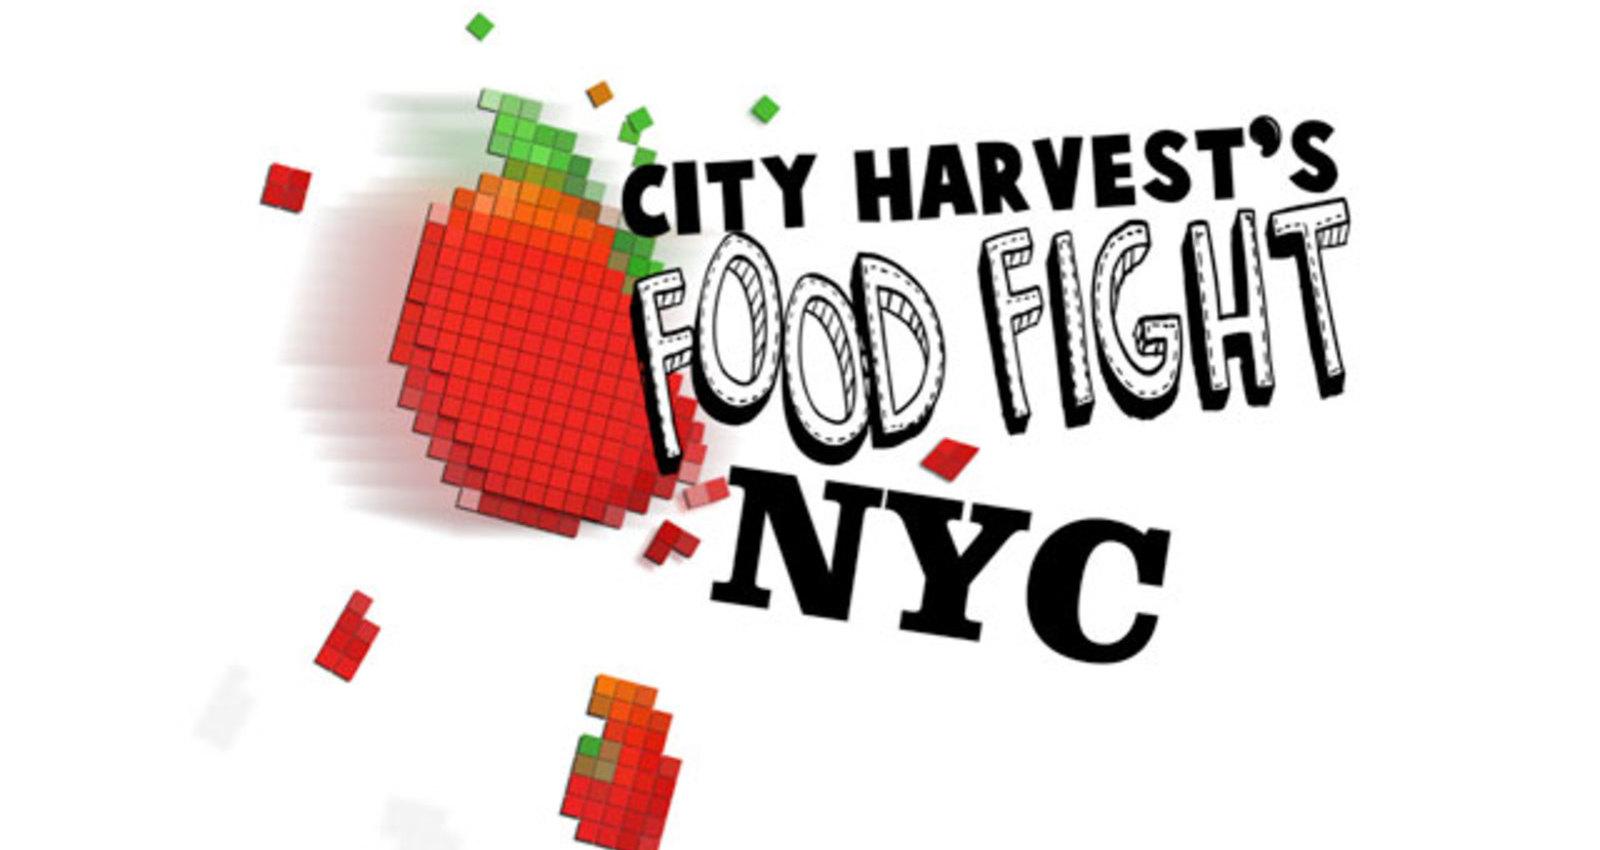 City Harvest's Food Fight NYC